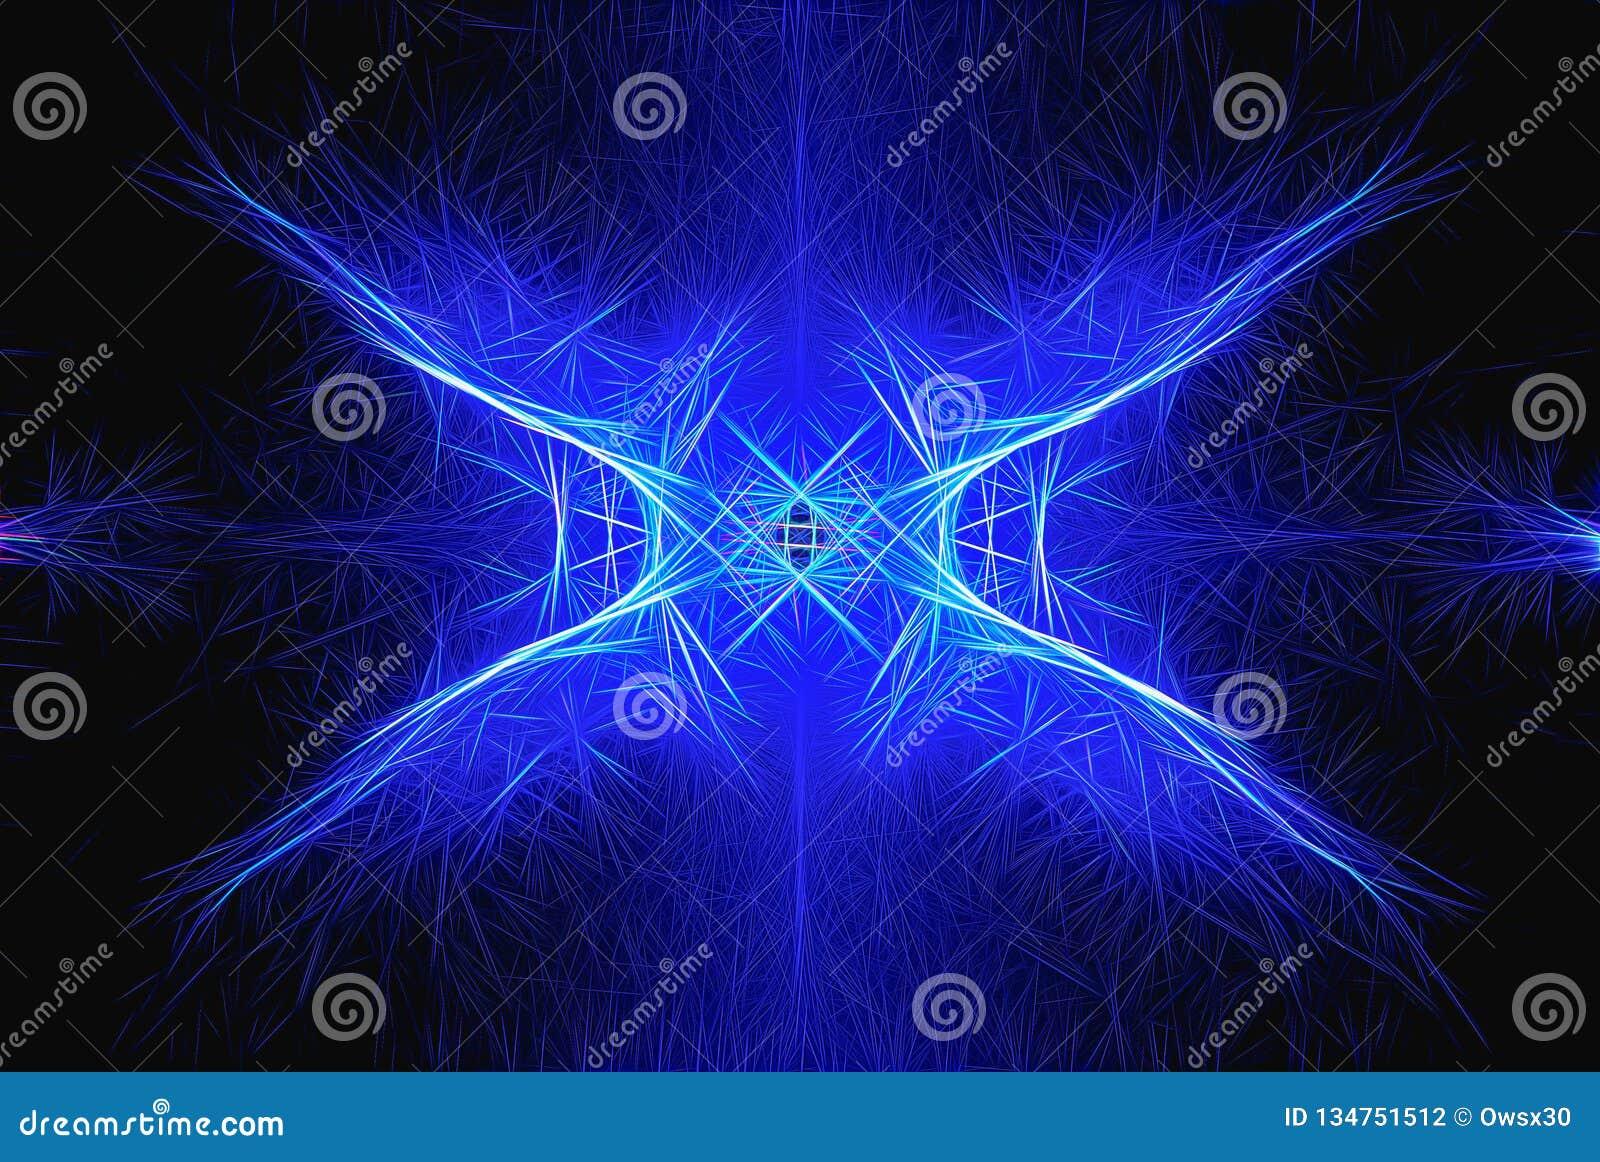 Błękitny symetryczny abstrakta wzór na ciemnym tle